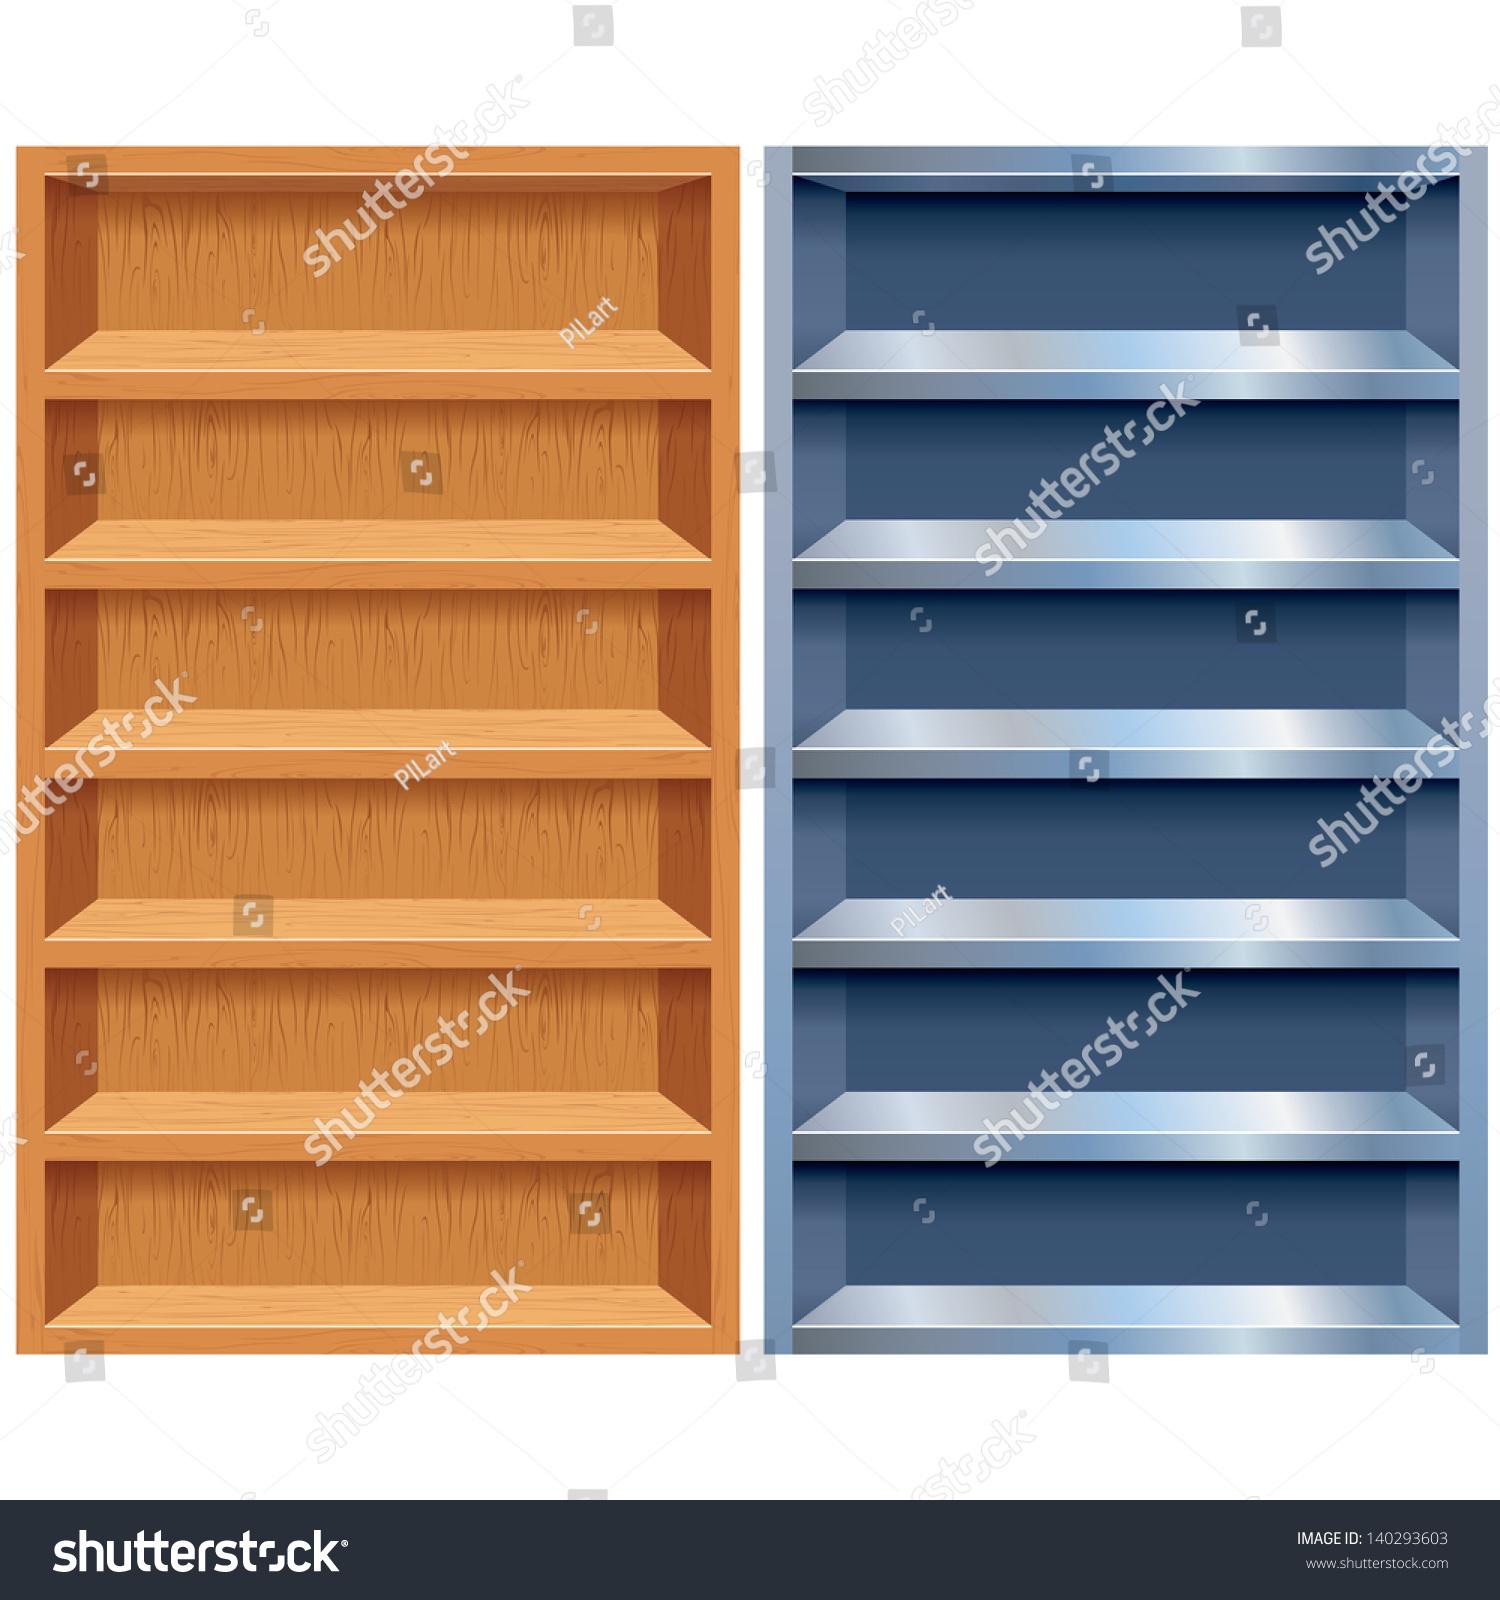 Shelf empty cupboard pencil. Bookshelf clipart display cabinet